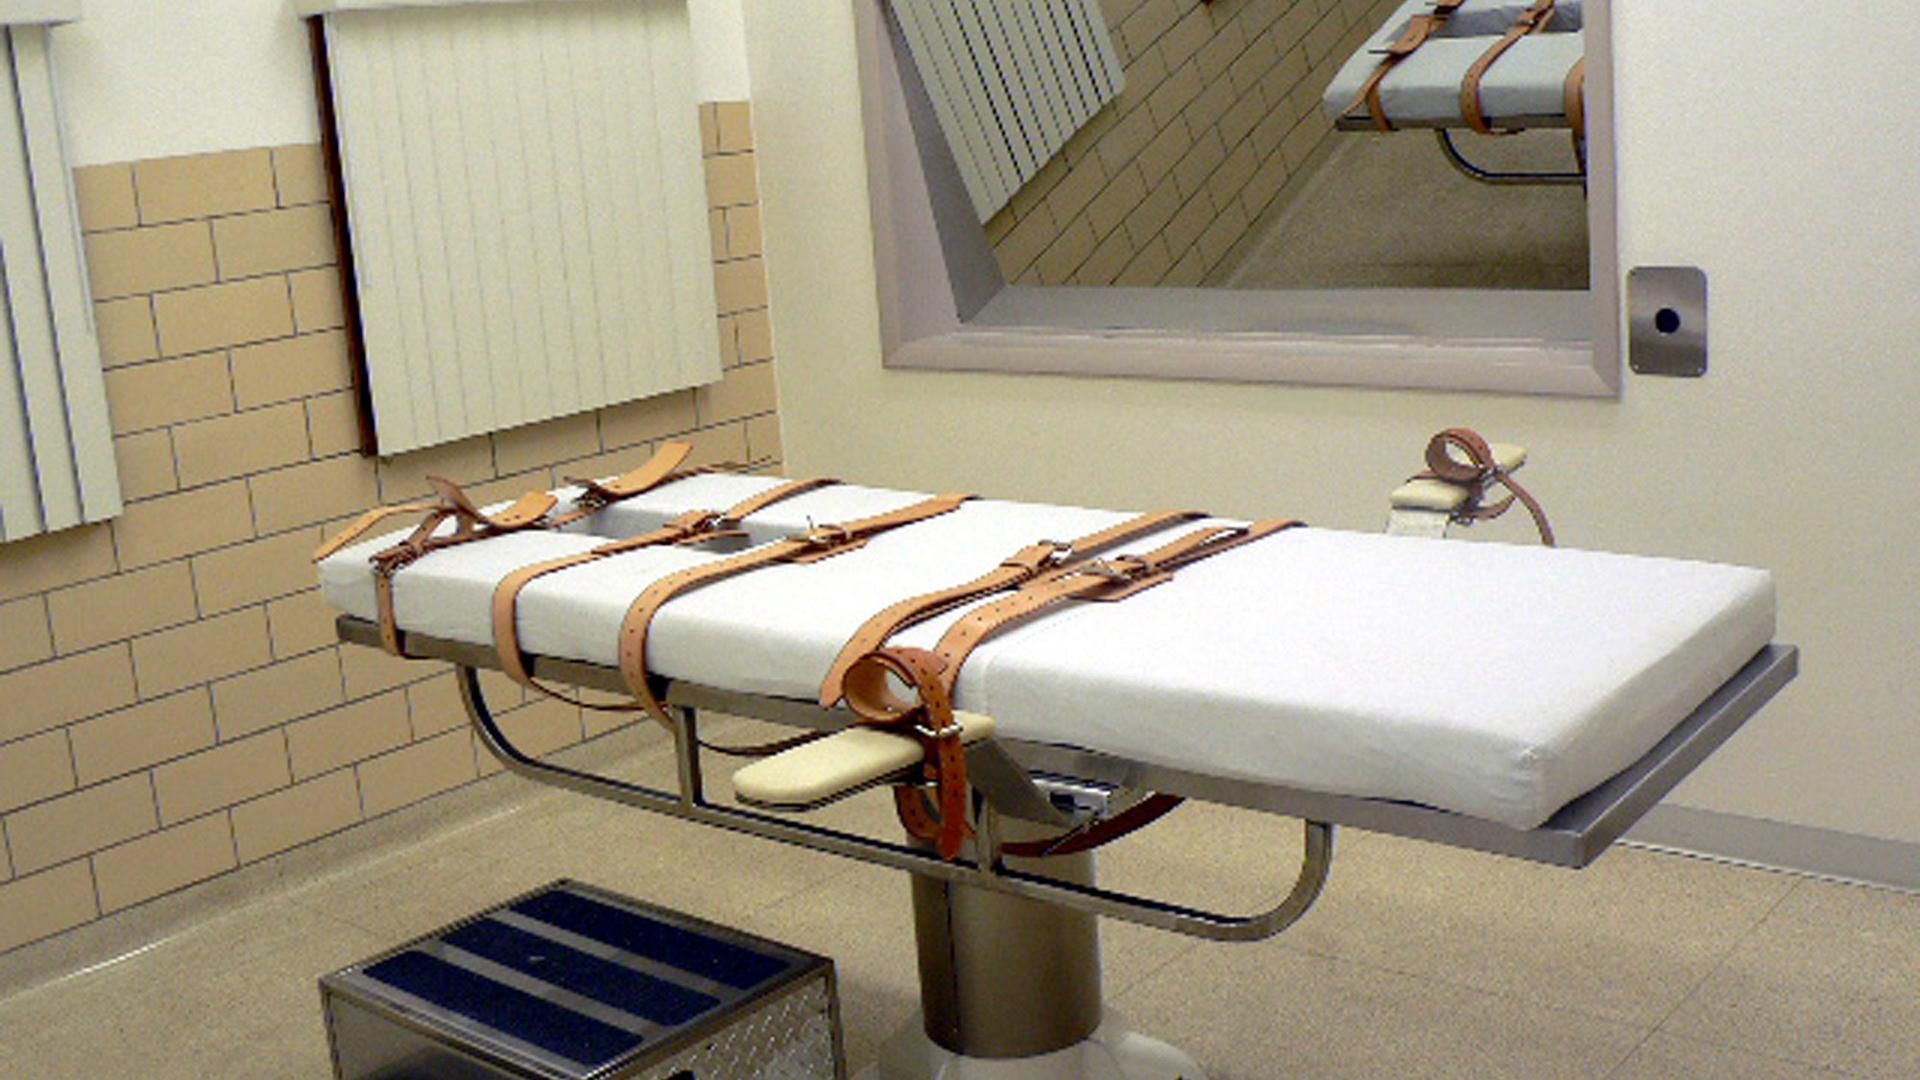 Woman on Death Row, Kelly Gissendaner, Seeks Clemency on Execution Eve